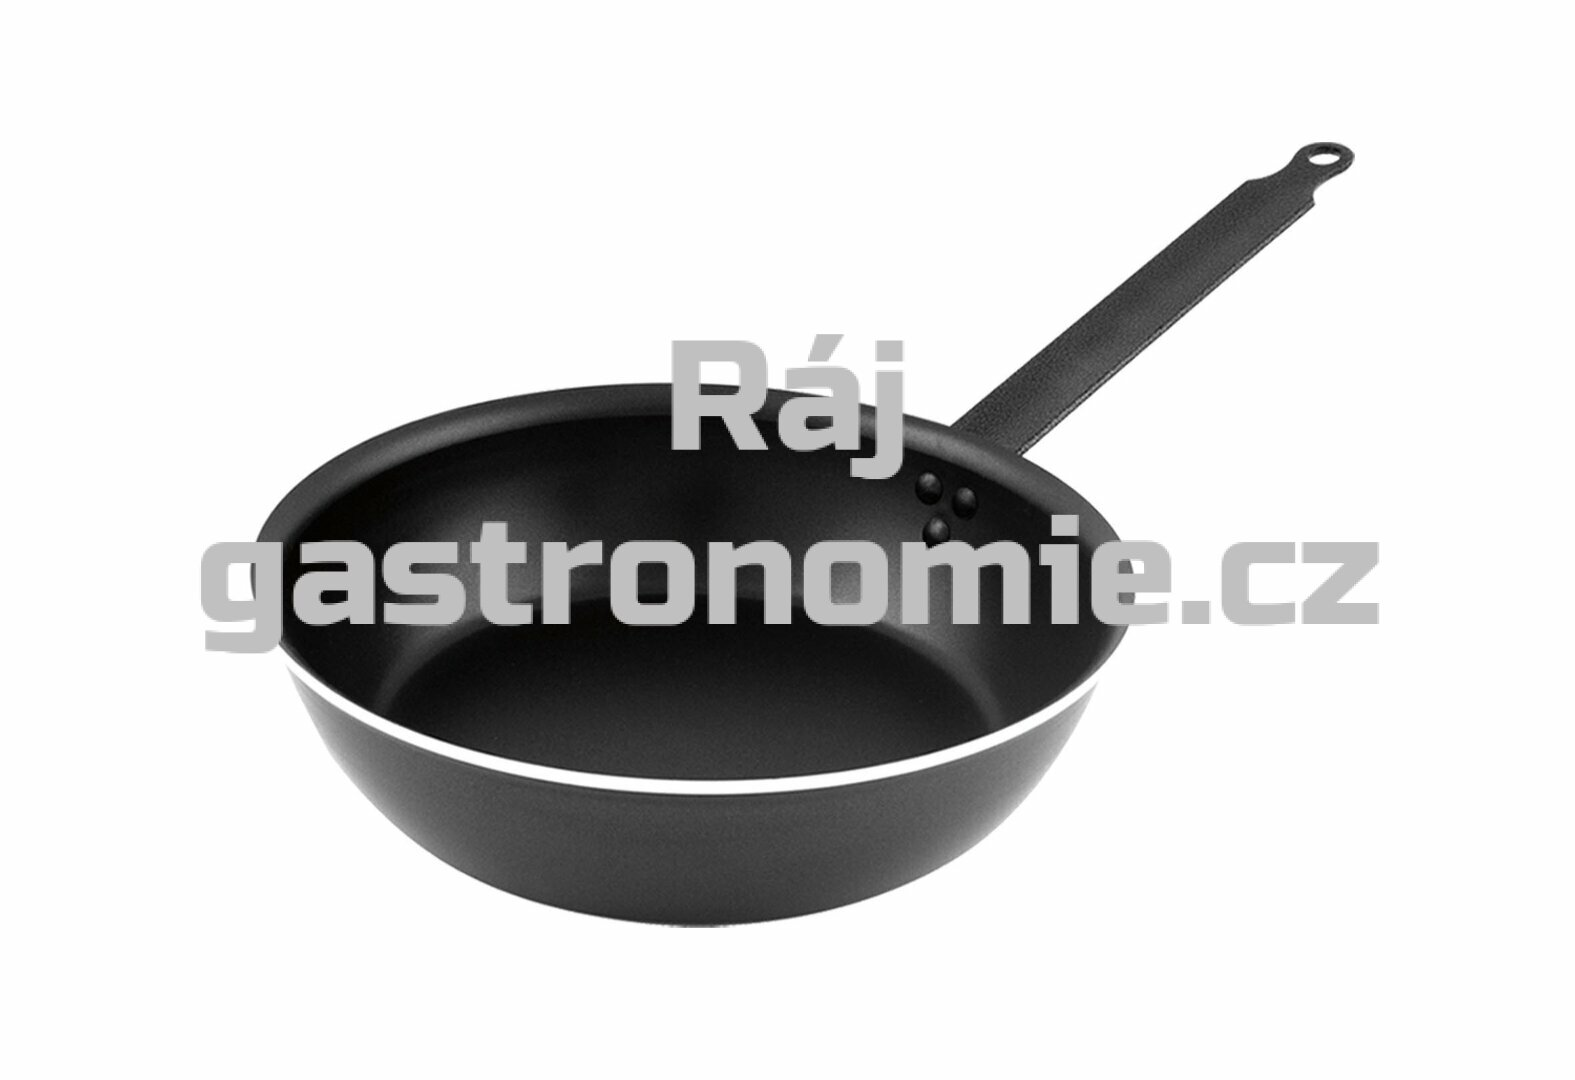 Pánev Al/Teflon na soté (Ø240 mm, hmotnost 0,95kg)